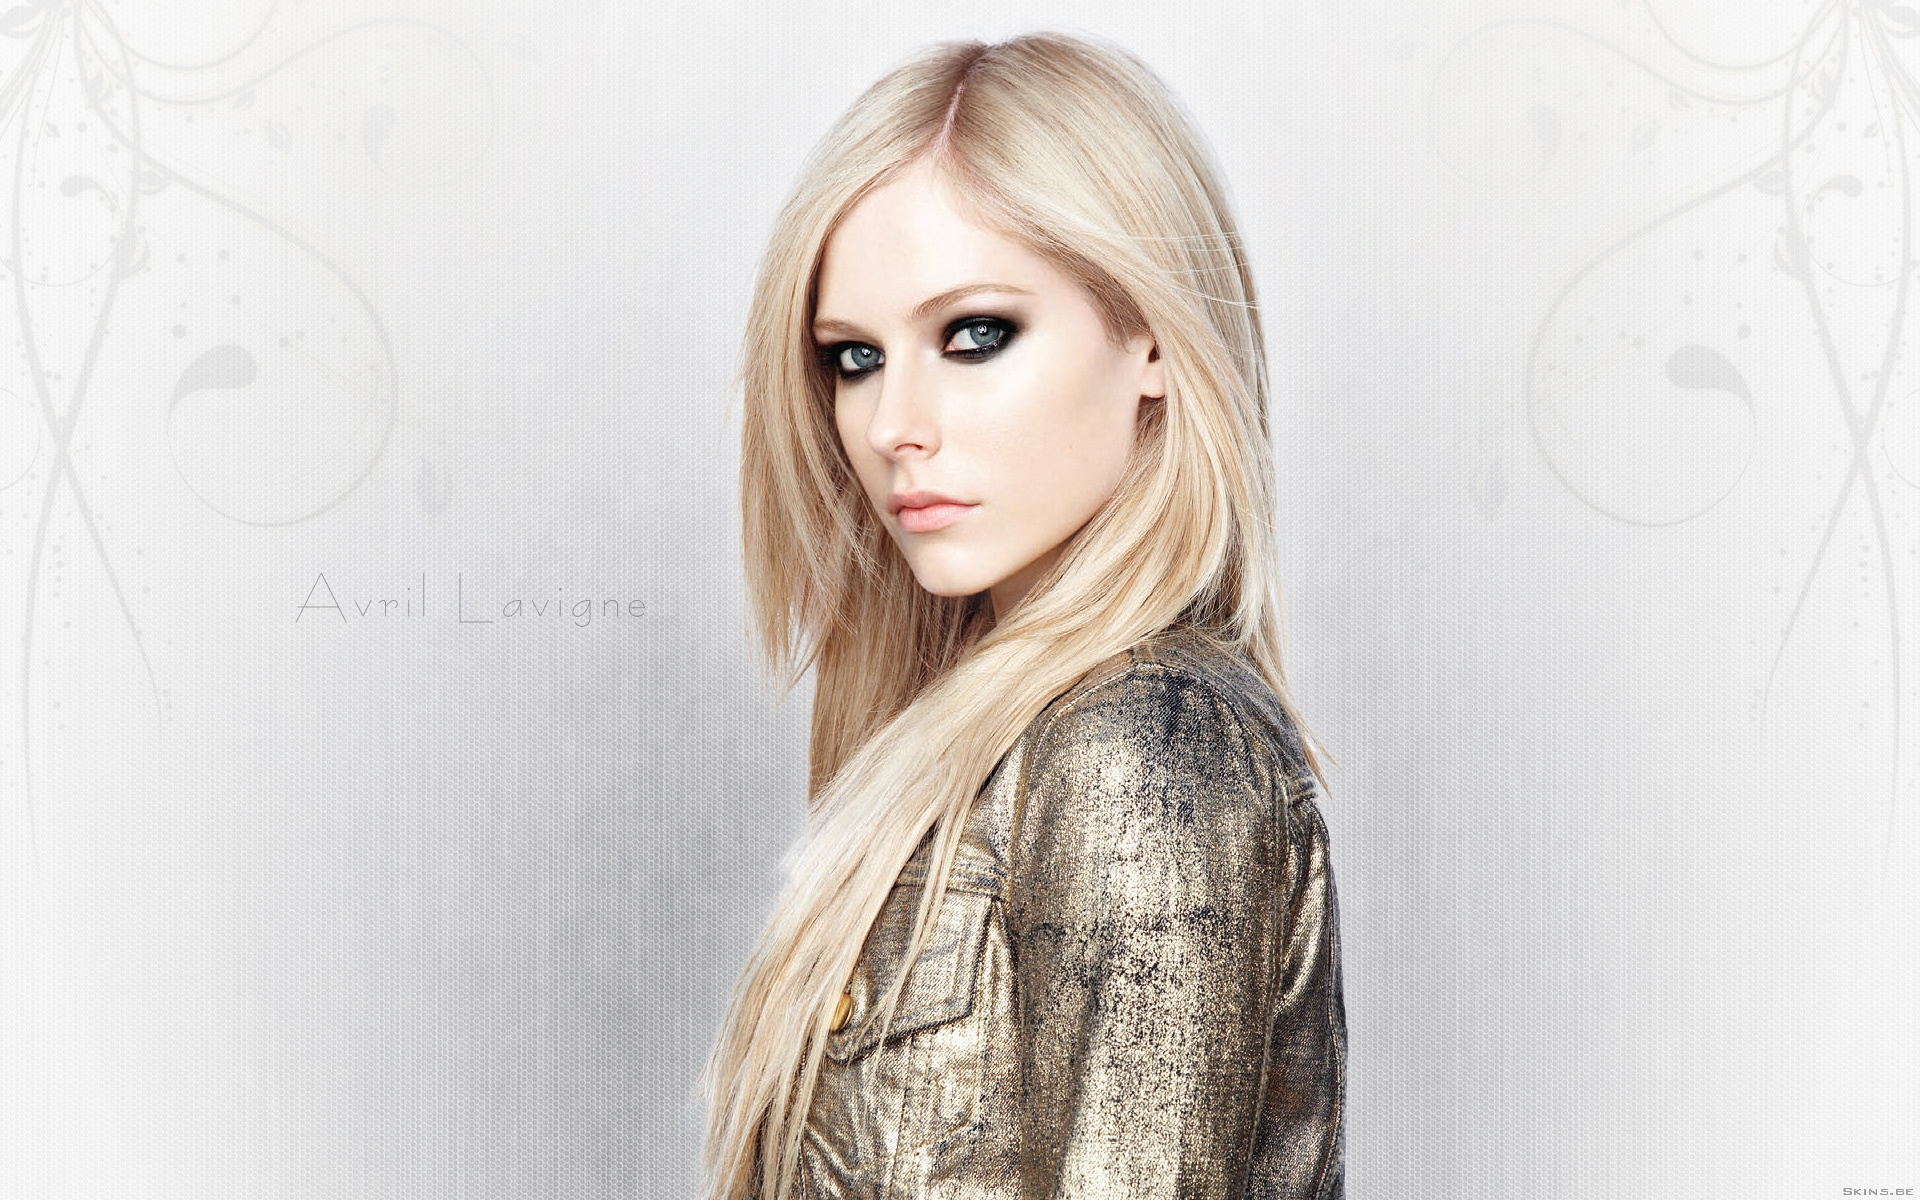 Avril Lavigne wallpaper (#41645)